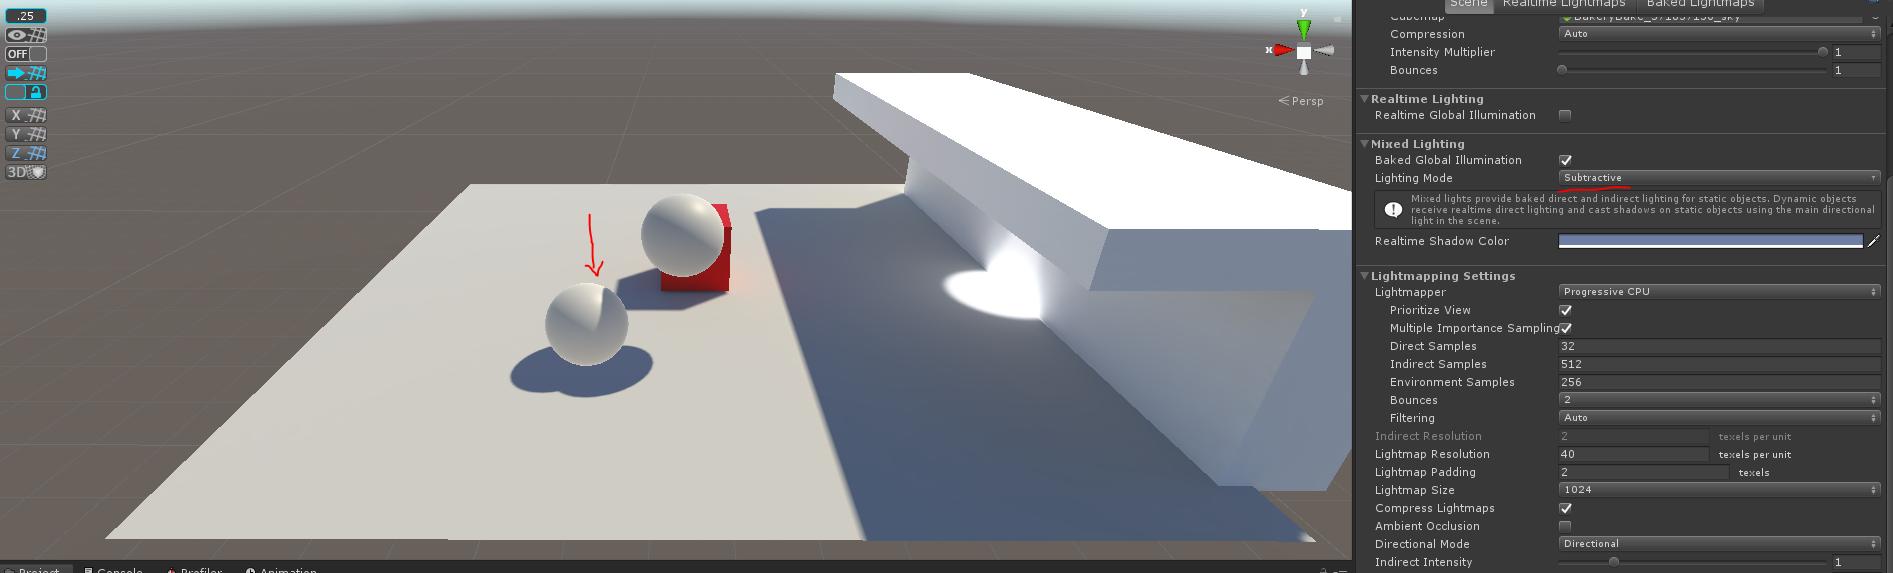 UnityNativeSubtractive_BothShadoworLight_on_spheres.PNG